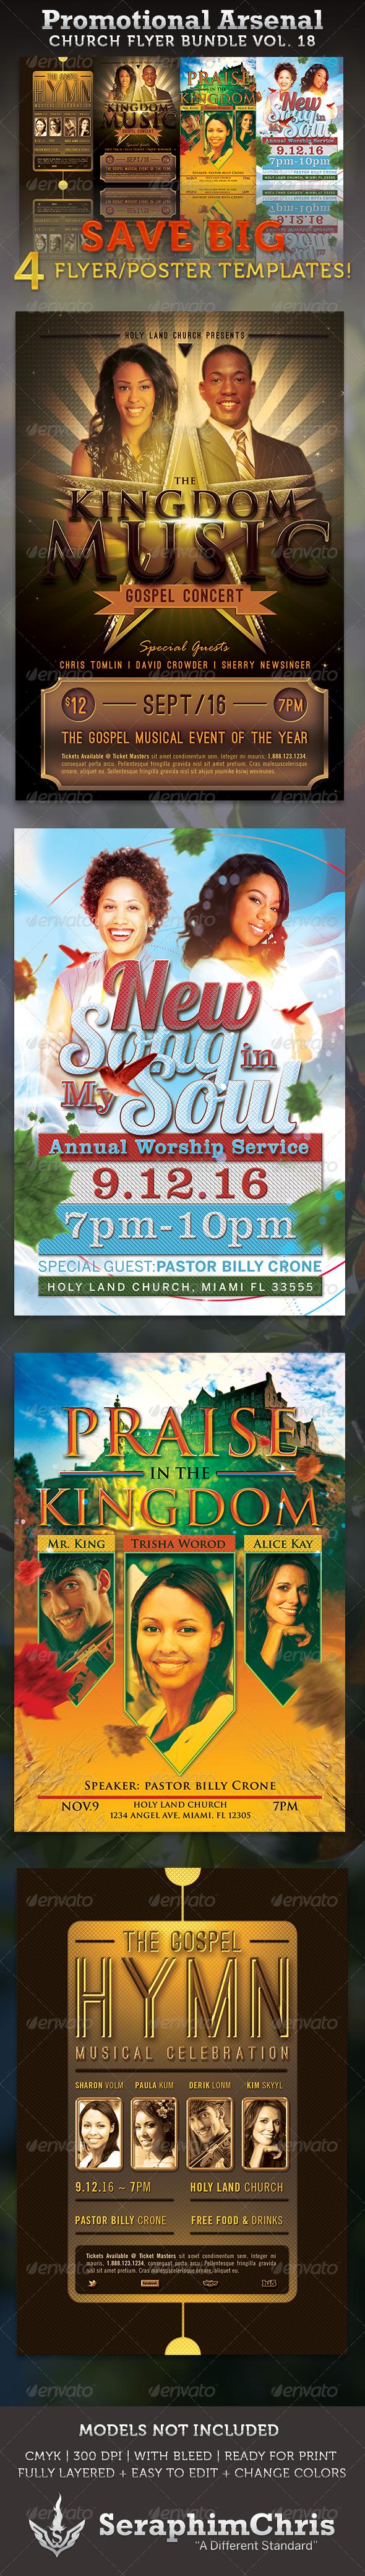 GraphicRiver Promotional Arsenal Church Flyer Bundle 18 3554626